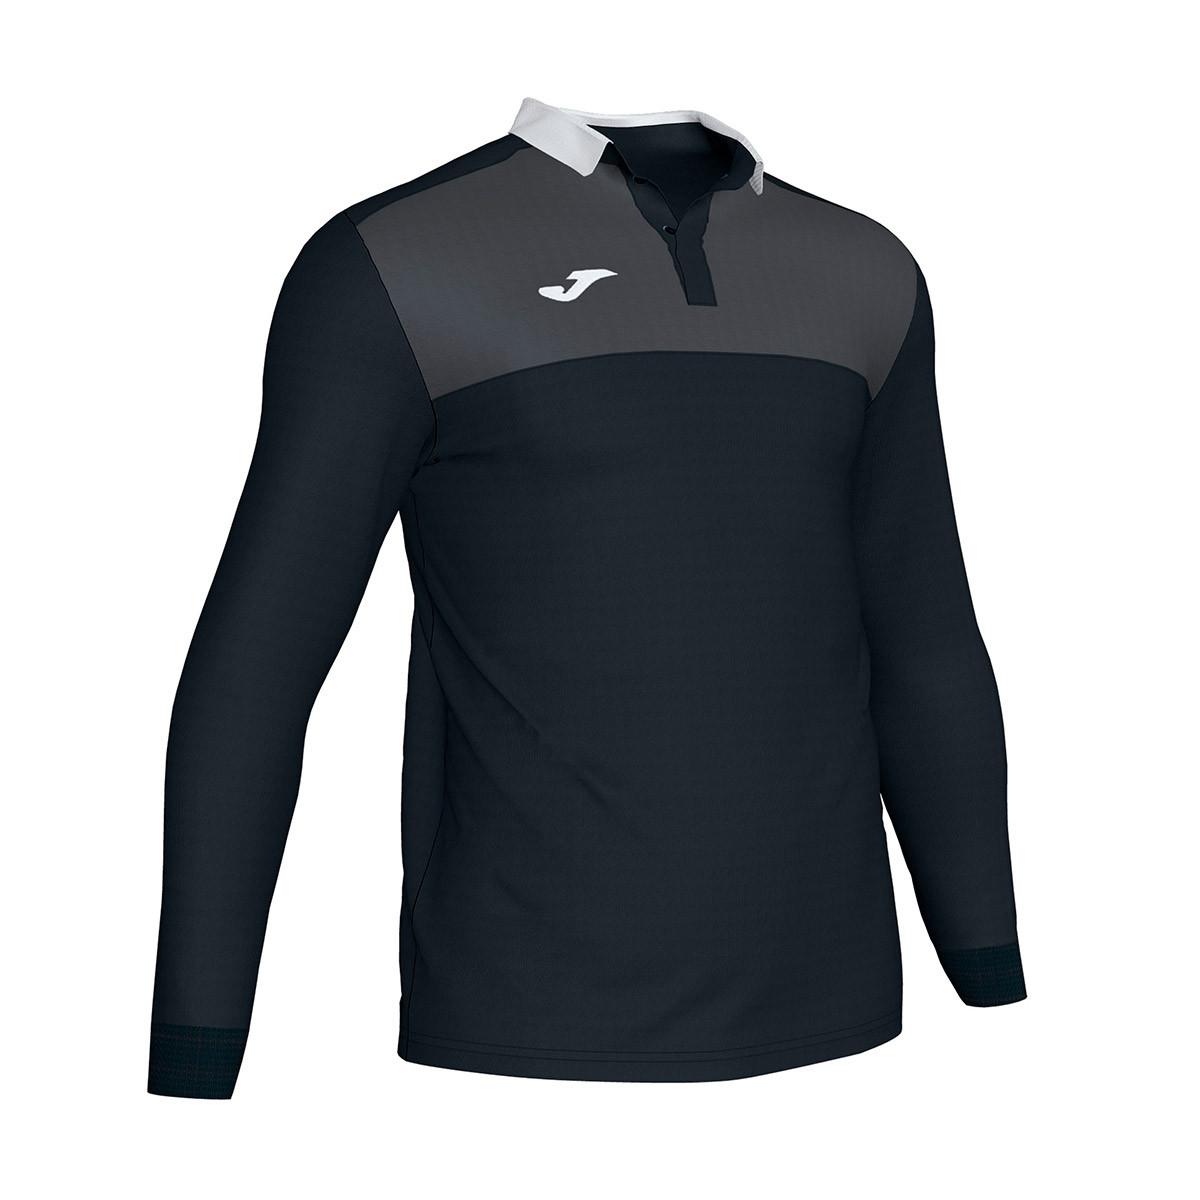 cb242b4ea0ce Polo shirt Joma Winner II m/l Black-Antracita - Football store ...